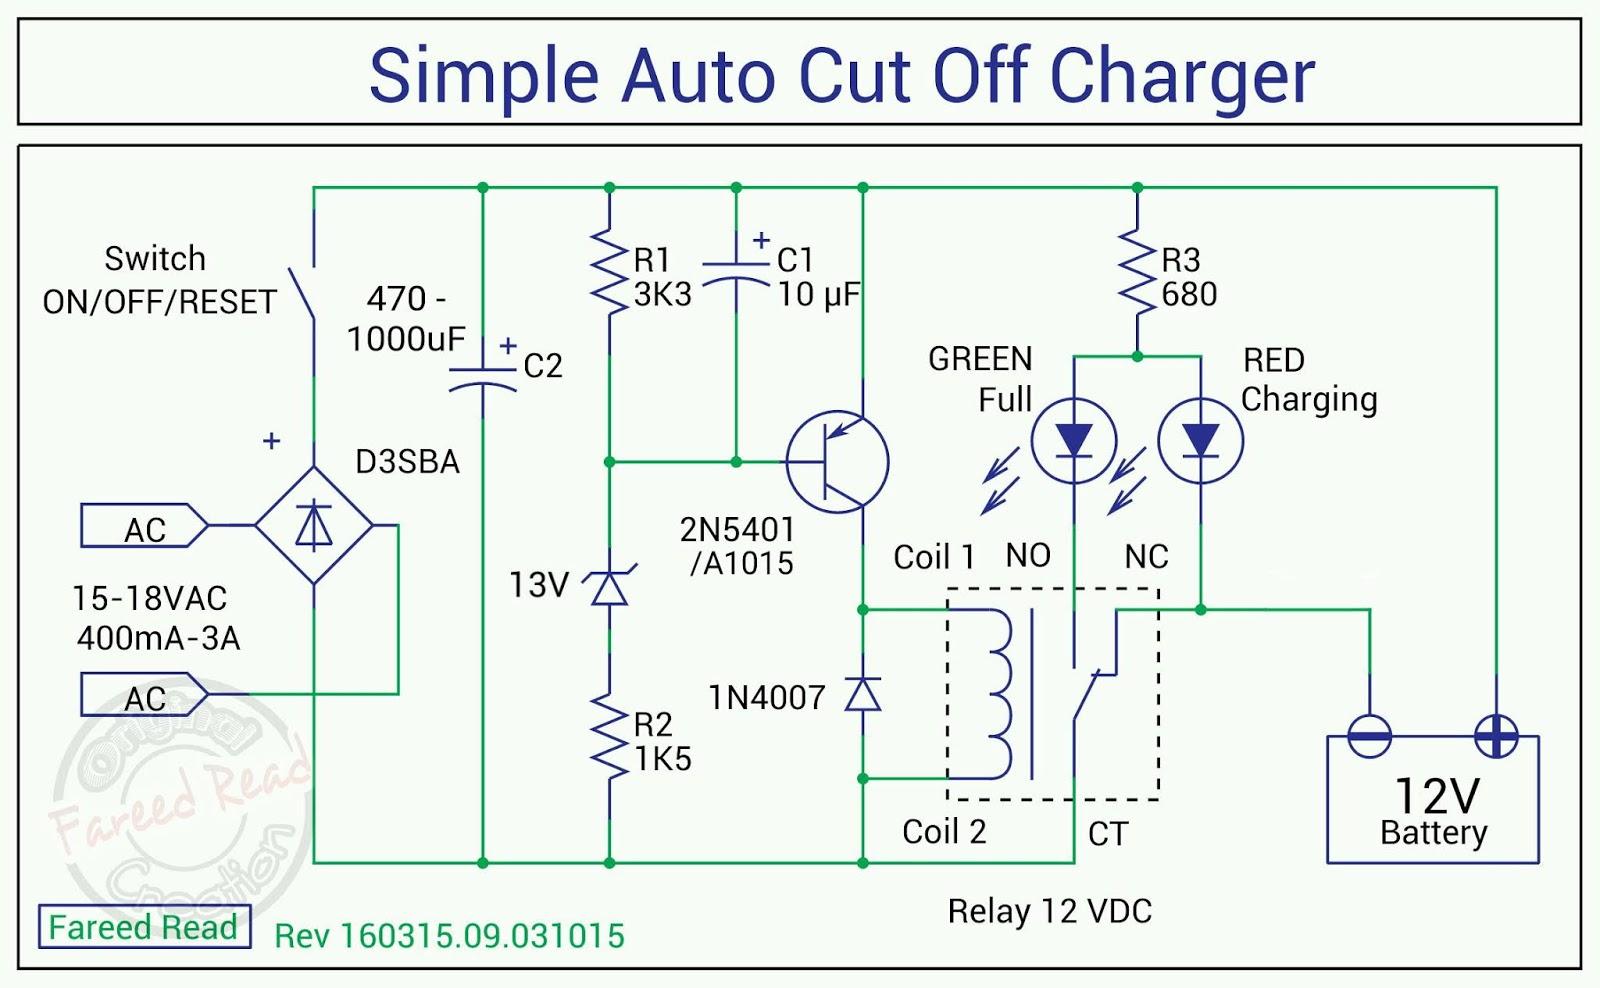 Charger Otomatis Untuk Aki Motor Atau Mobil Auto Cut Off Relay 12 Volt 5 Kaki Skema Cutt